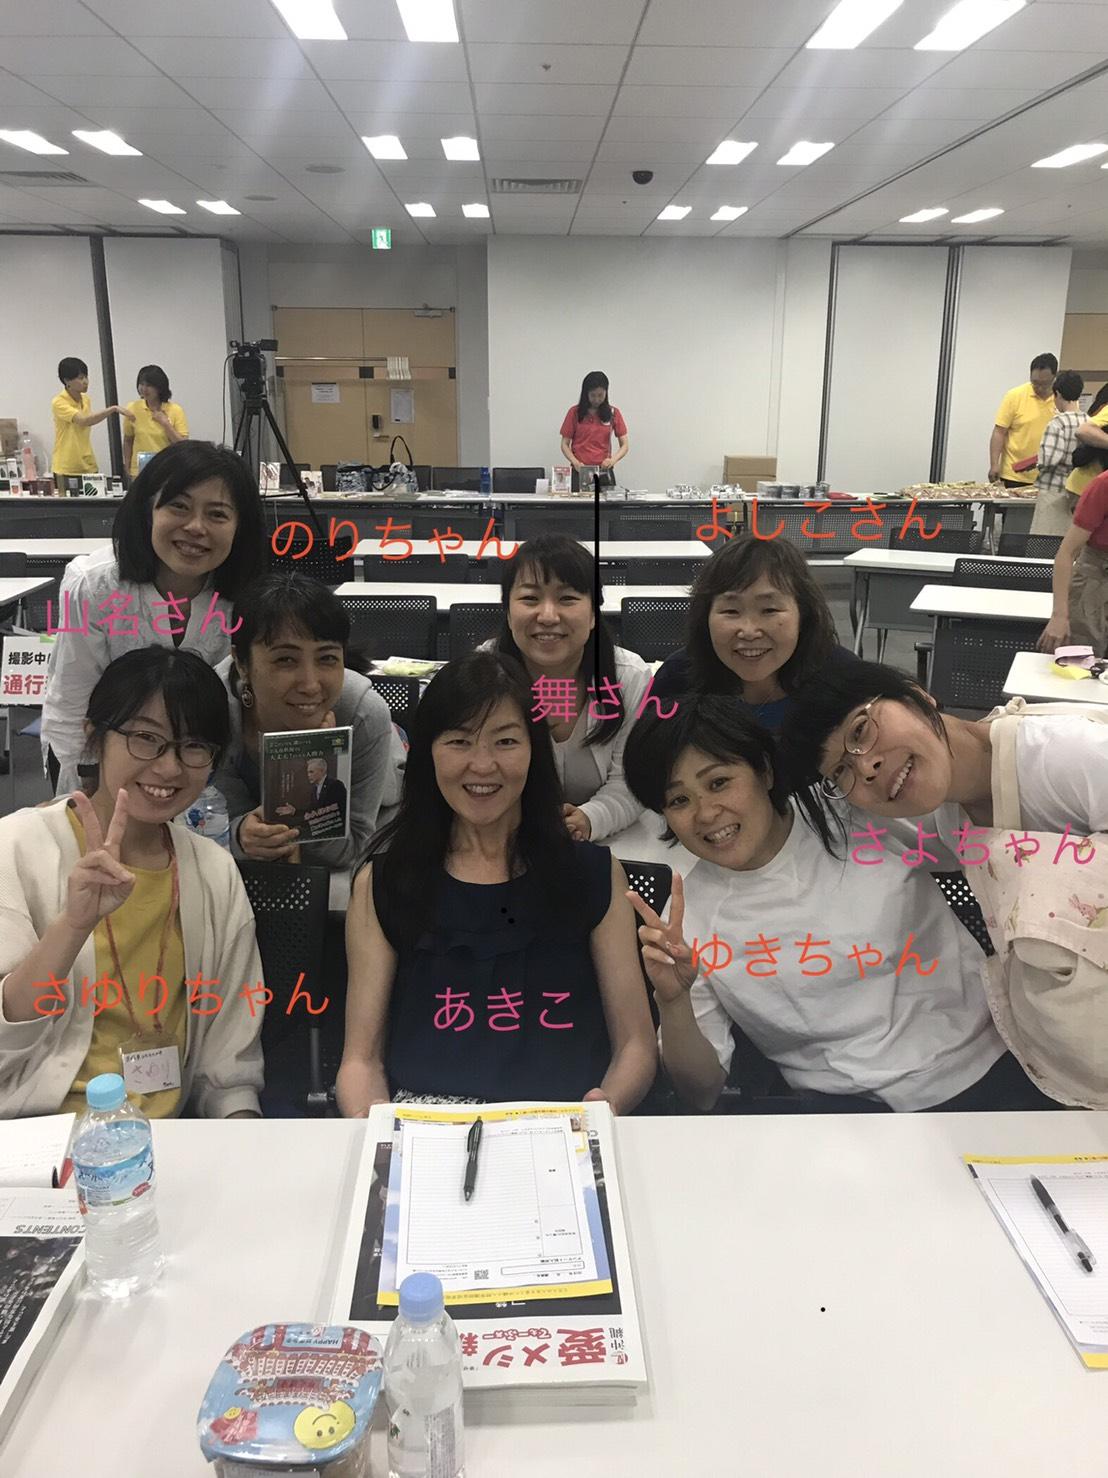 2019/5/28 1010HAPPY藤沢クラスAグループ